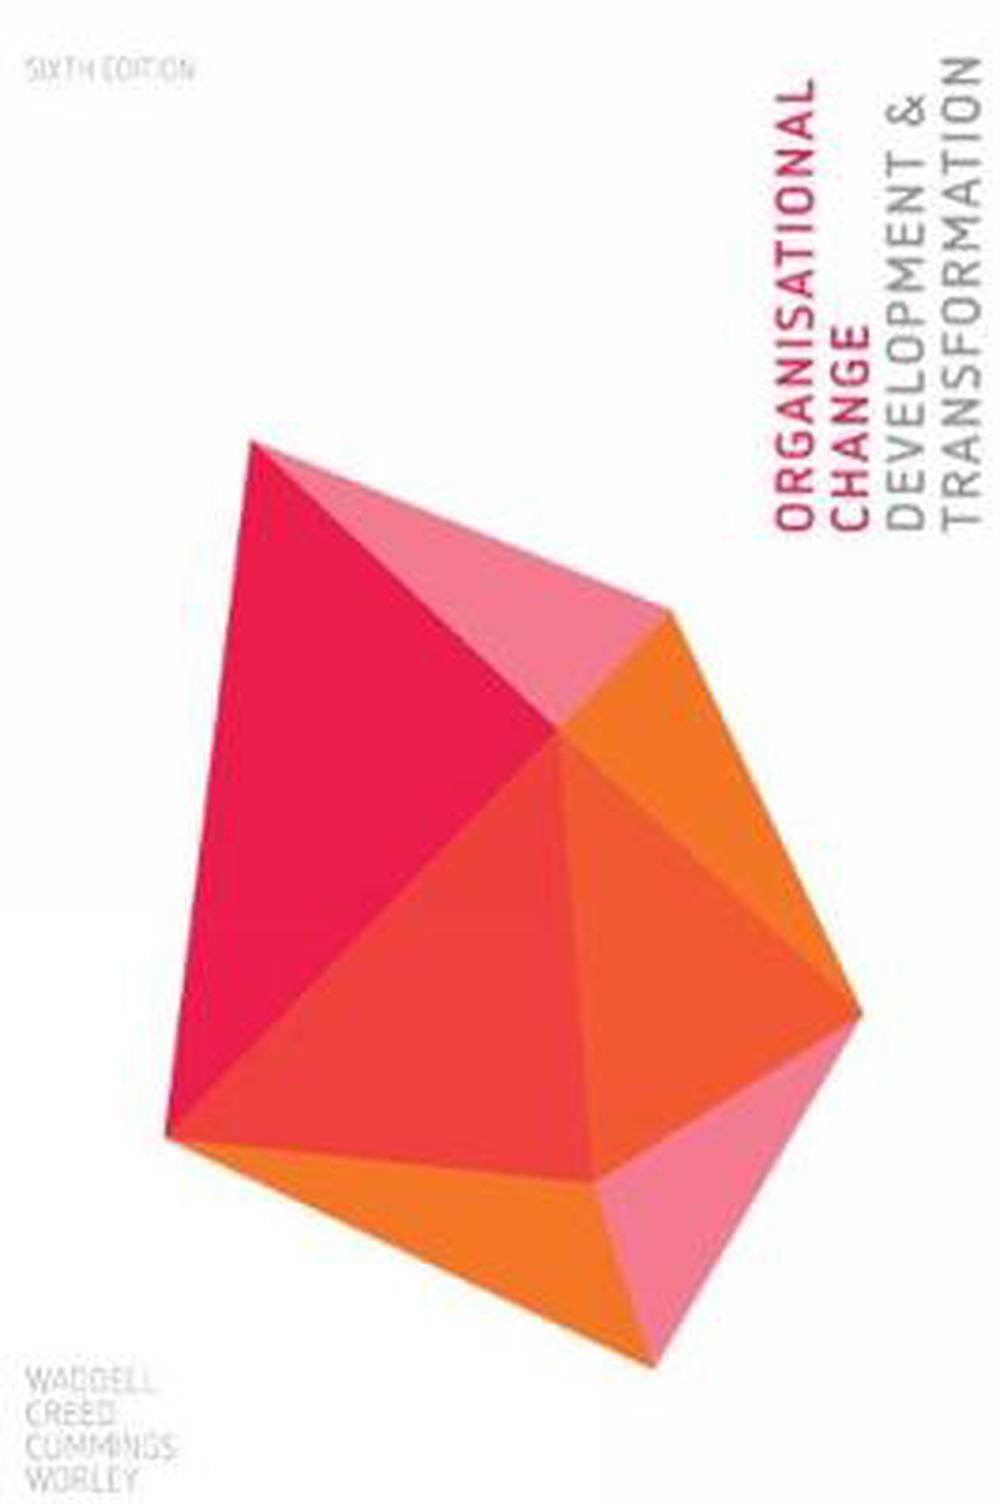 organisational change development and transformation 6th edition ebook